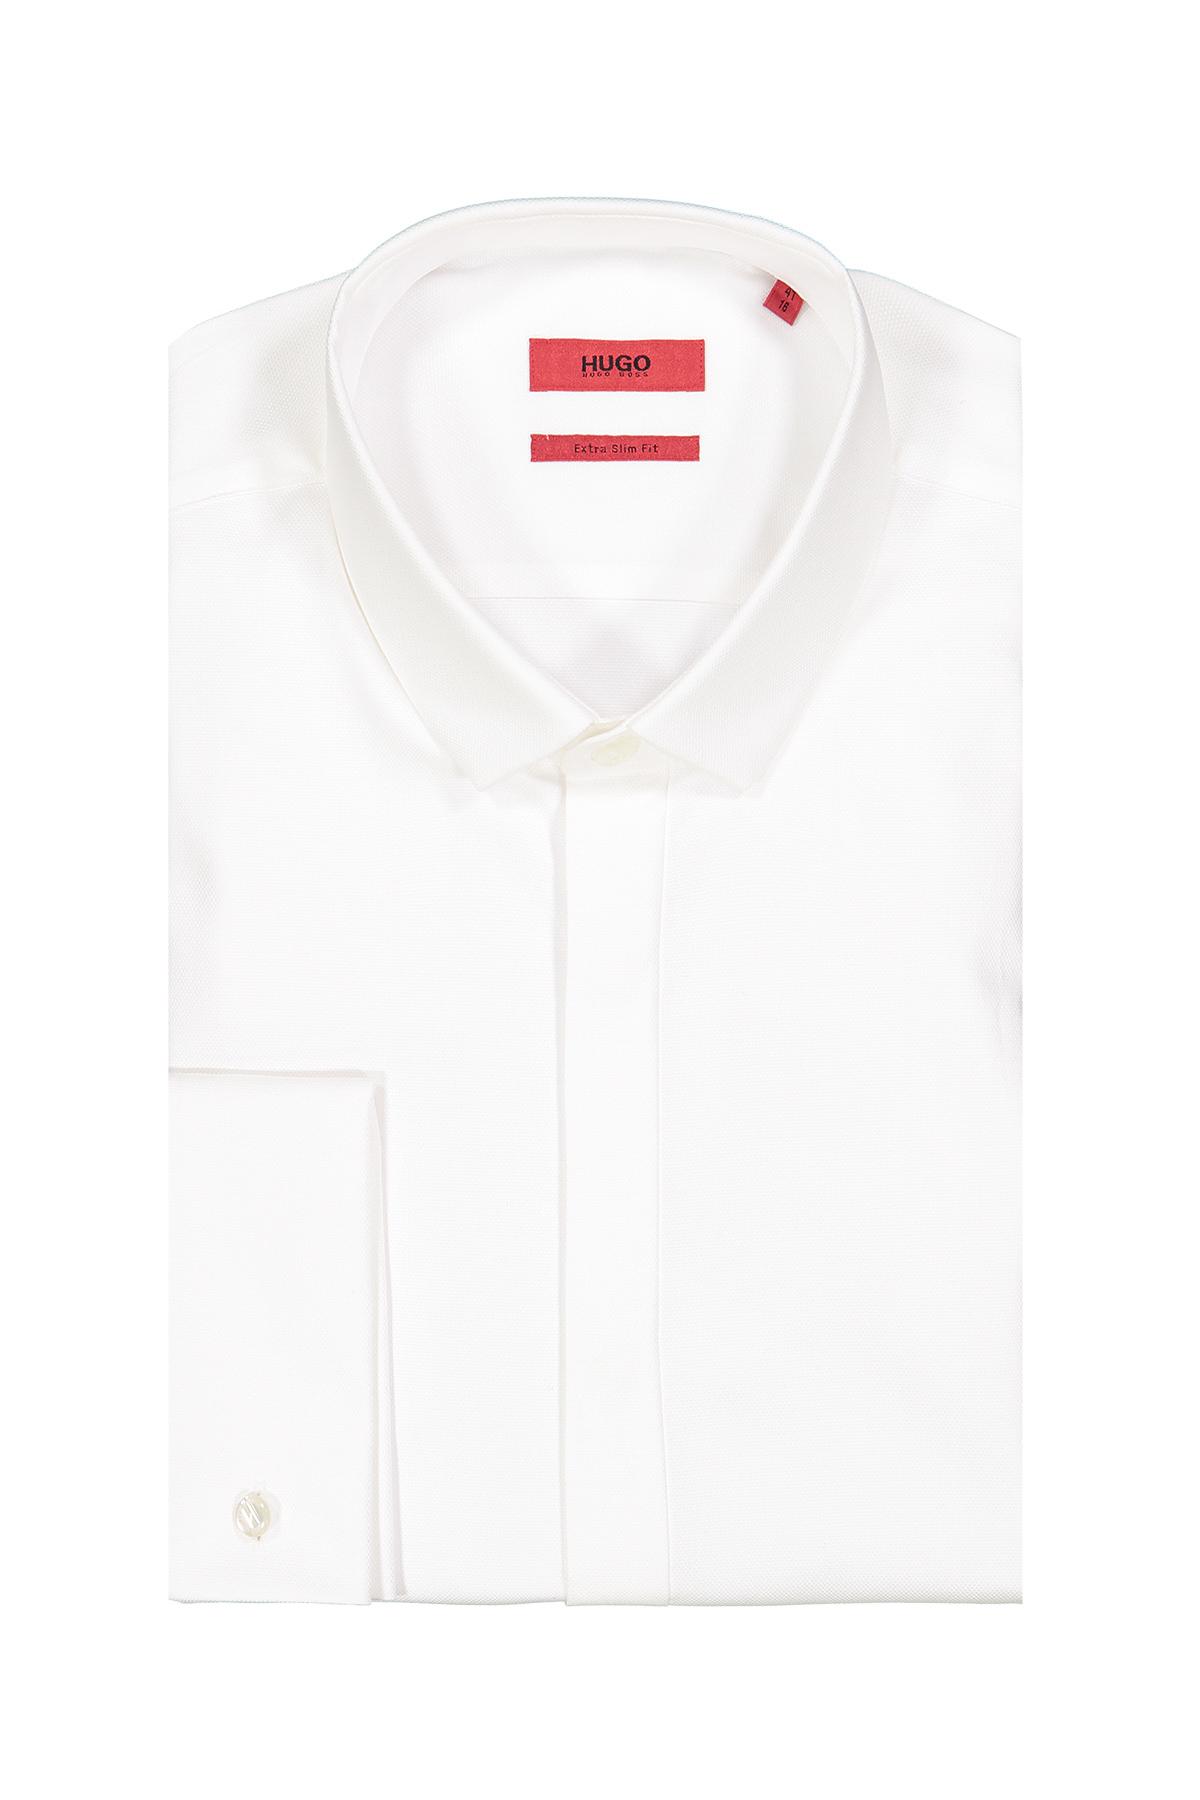 Camisa Hugo Boss, Extra slim fit, blanca cuello pequeño, puño doble.